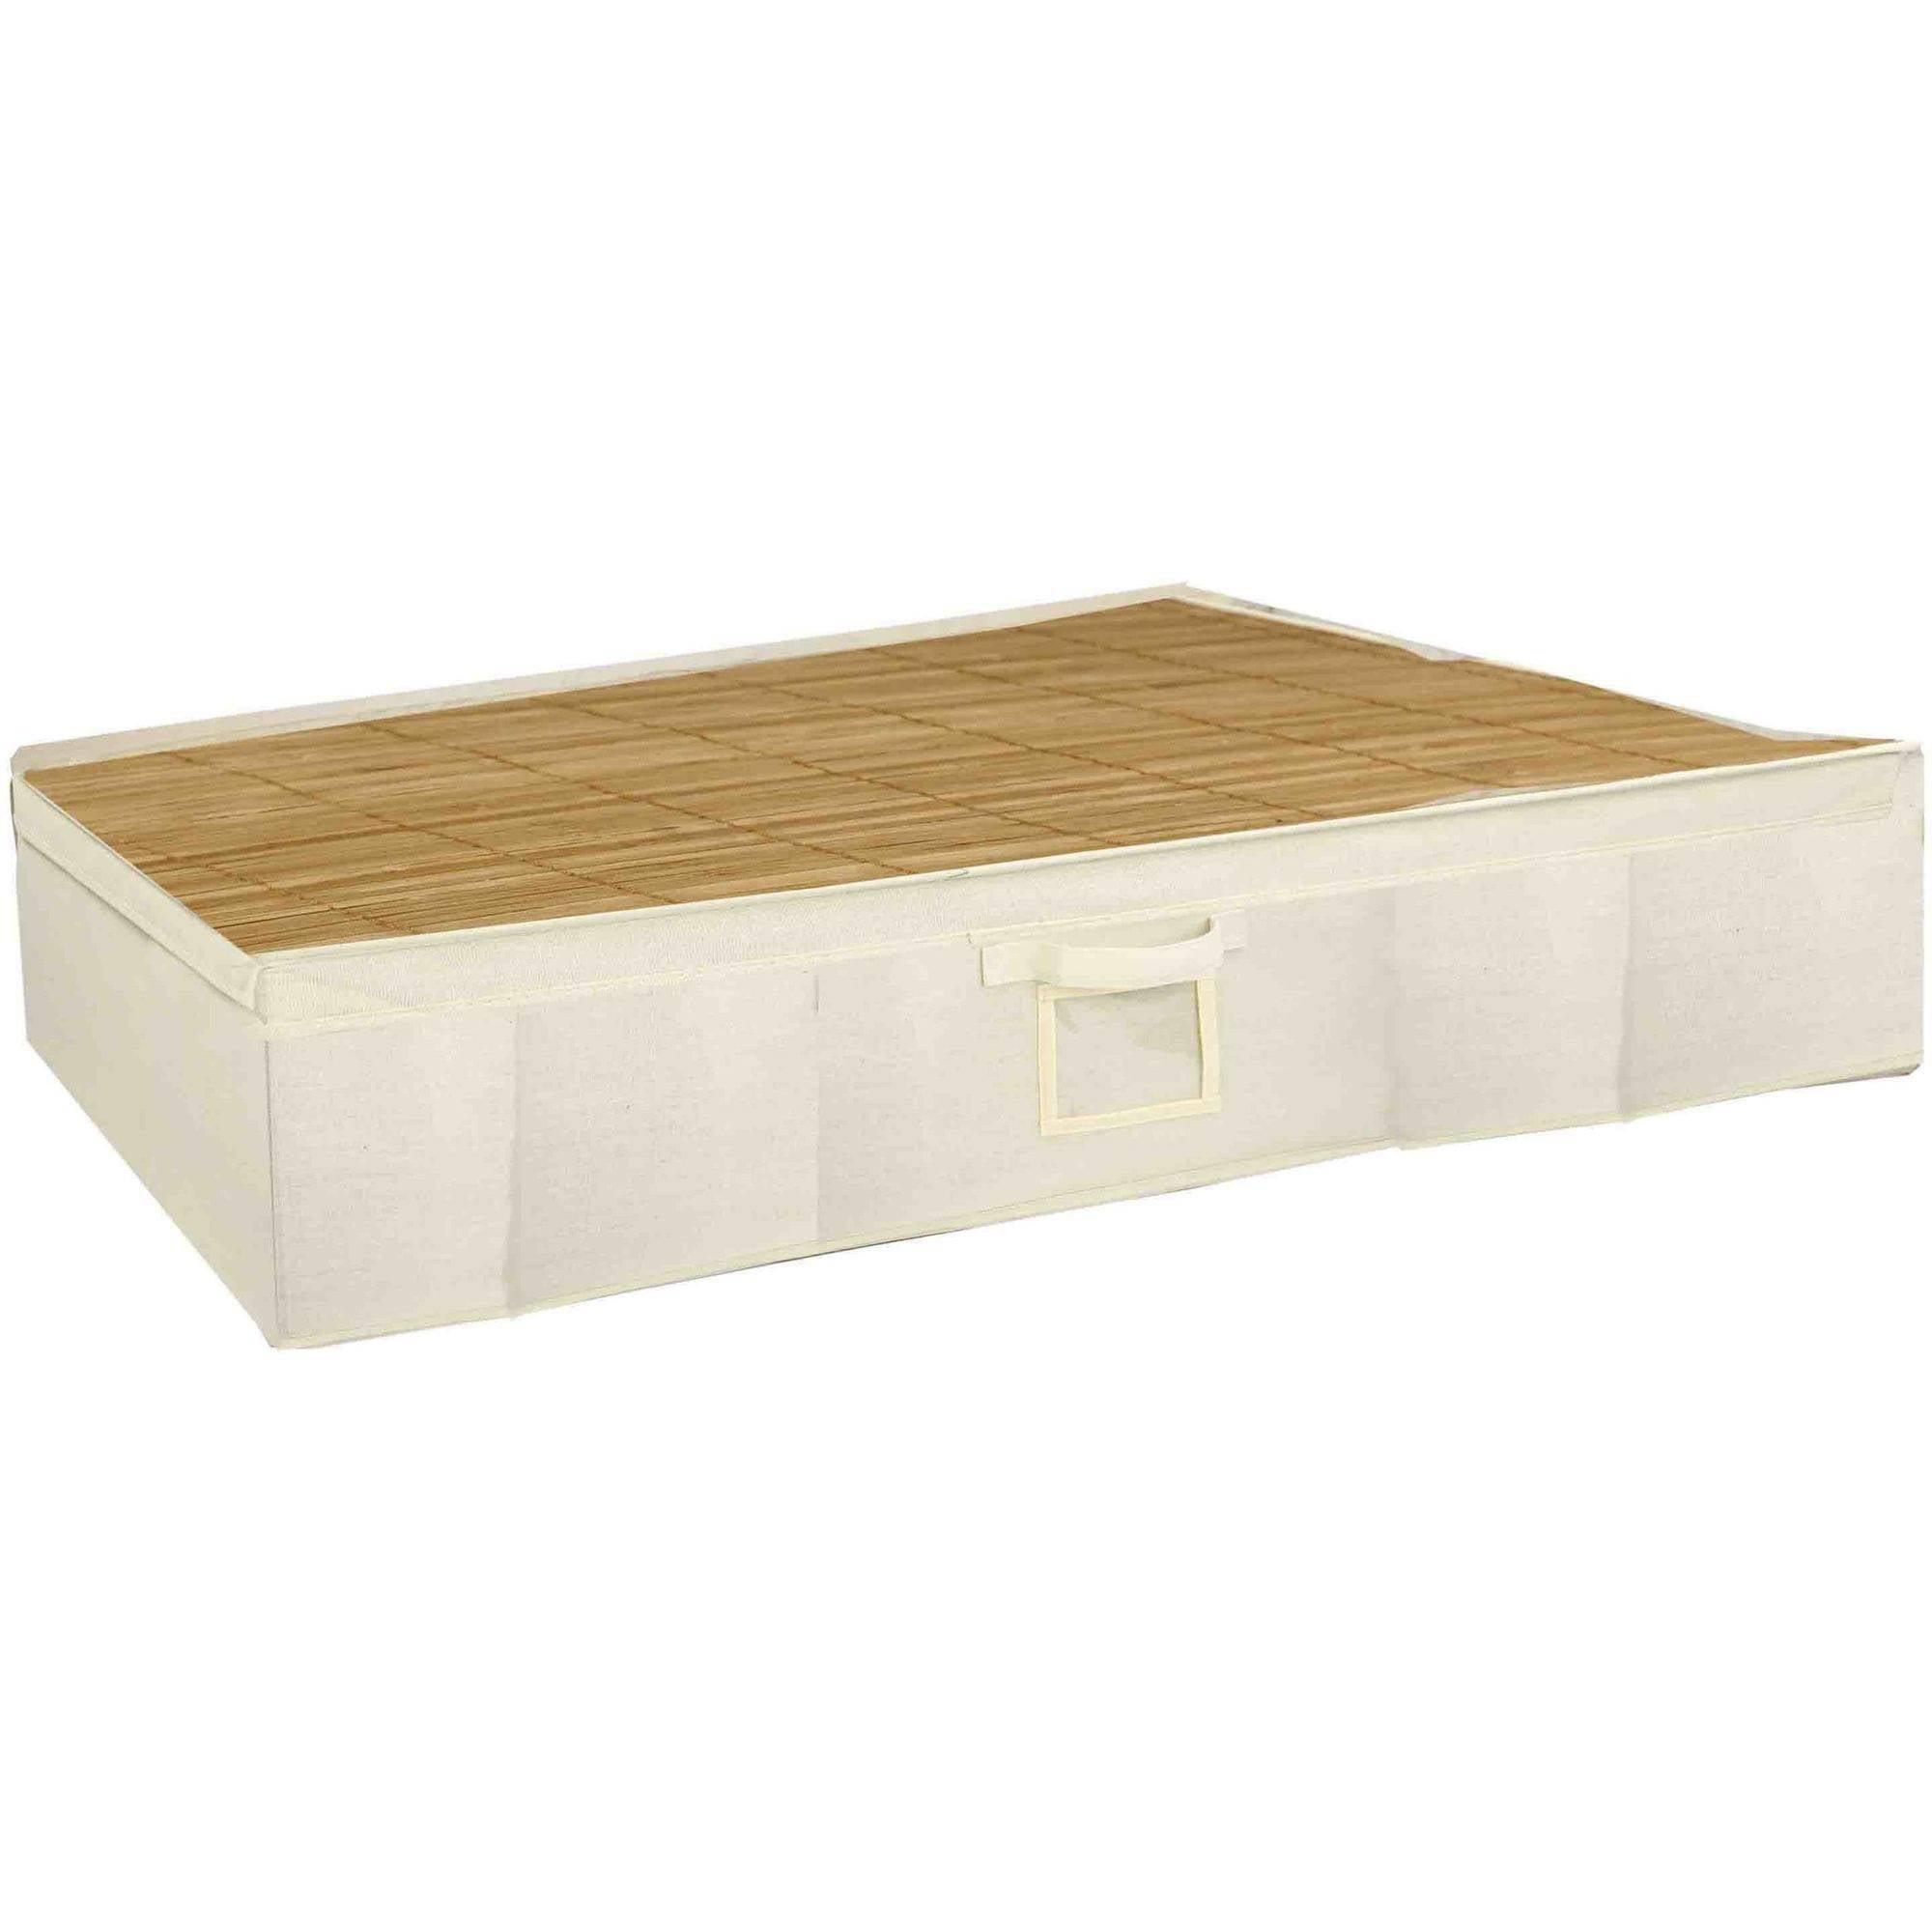 home basics under-the-bed bamboo storage box - walmart